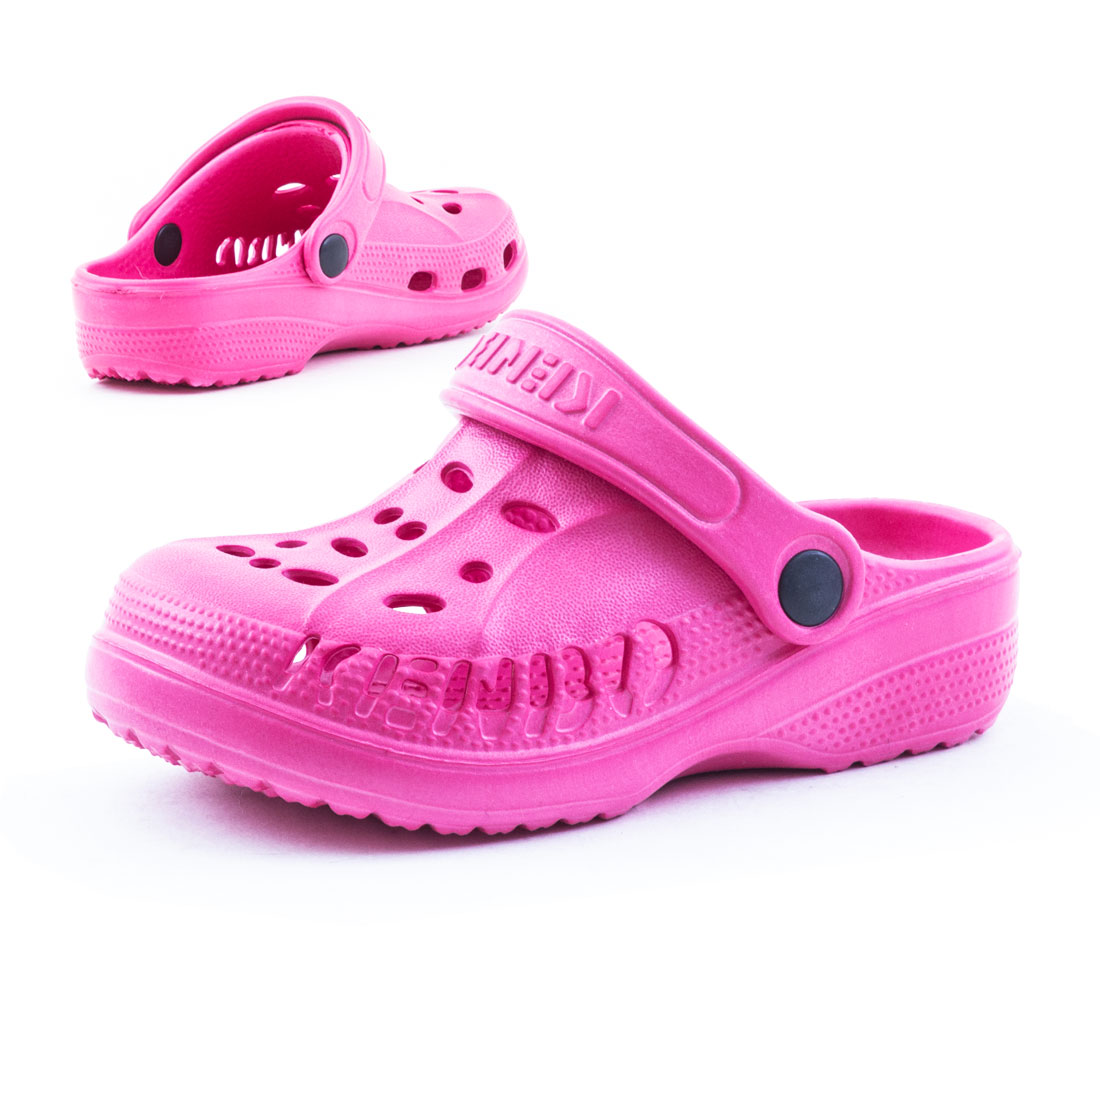 neu damen kinder unisex sandalen wasser sommer garten schuhe gr 26 46 ebay. Black Bedroom Furniture Sets. Home Design Ideas